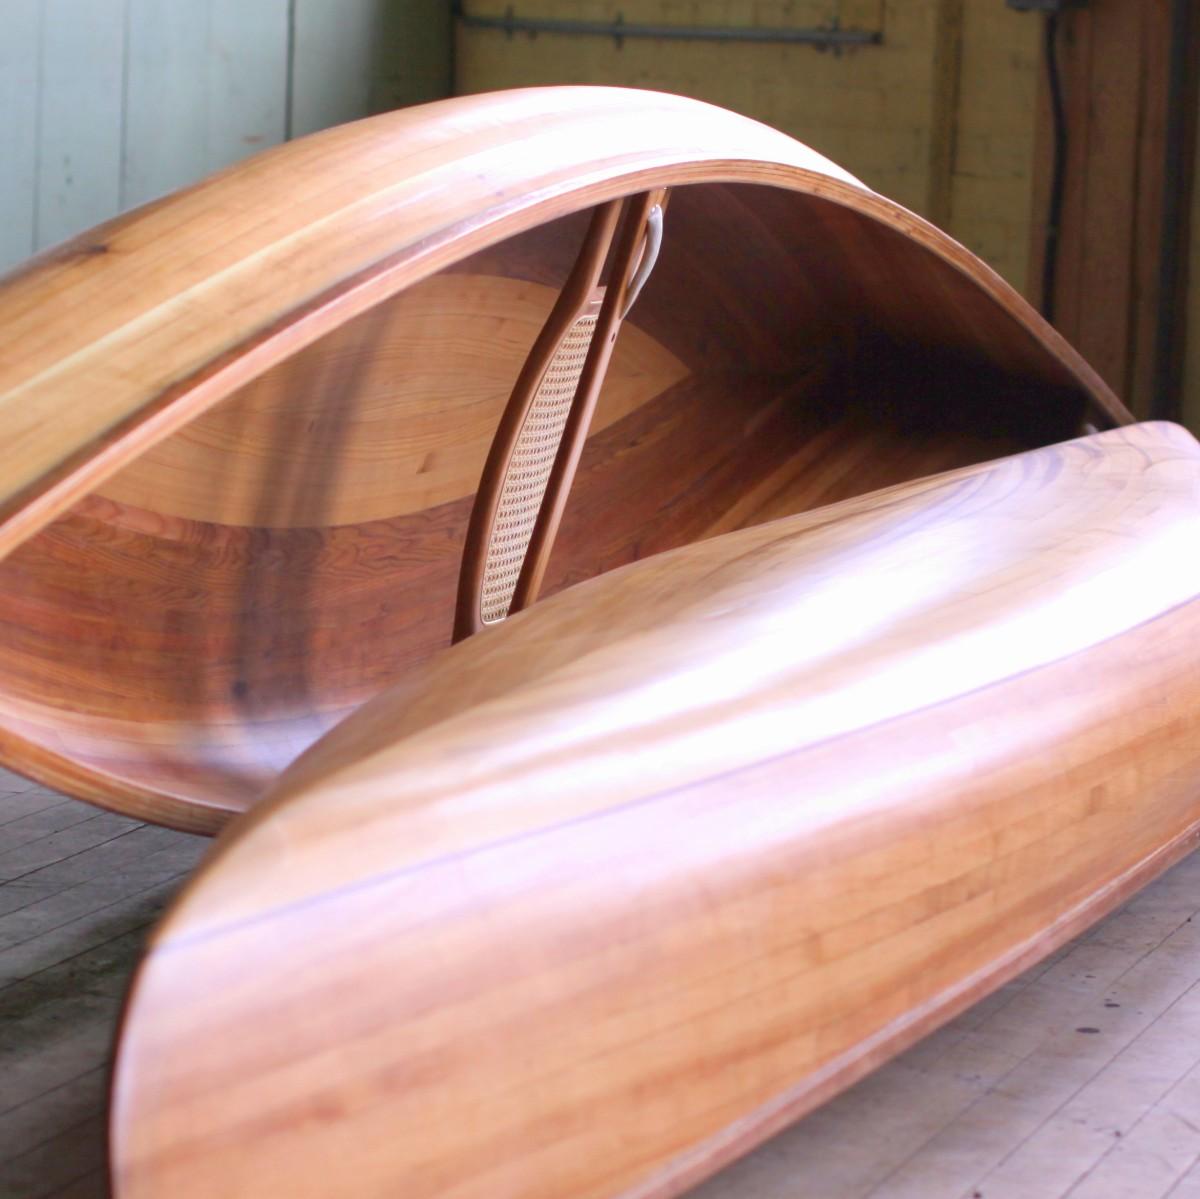 Two Solo Cedar Strip Canoes in the Studio